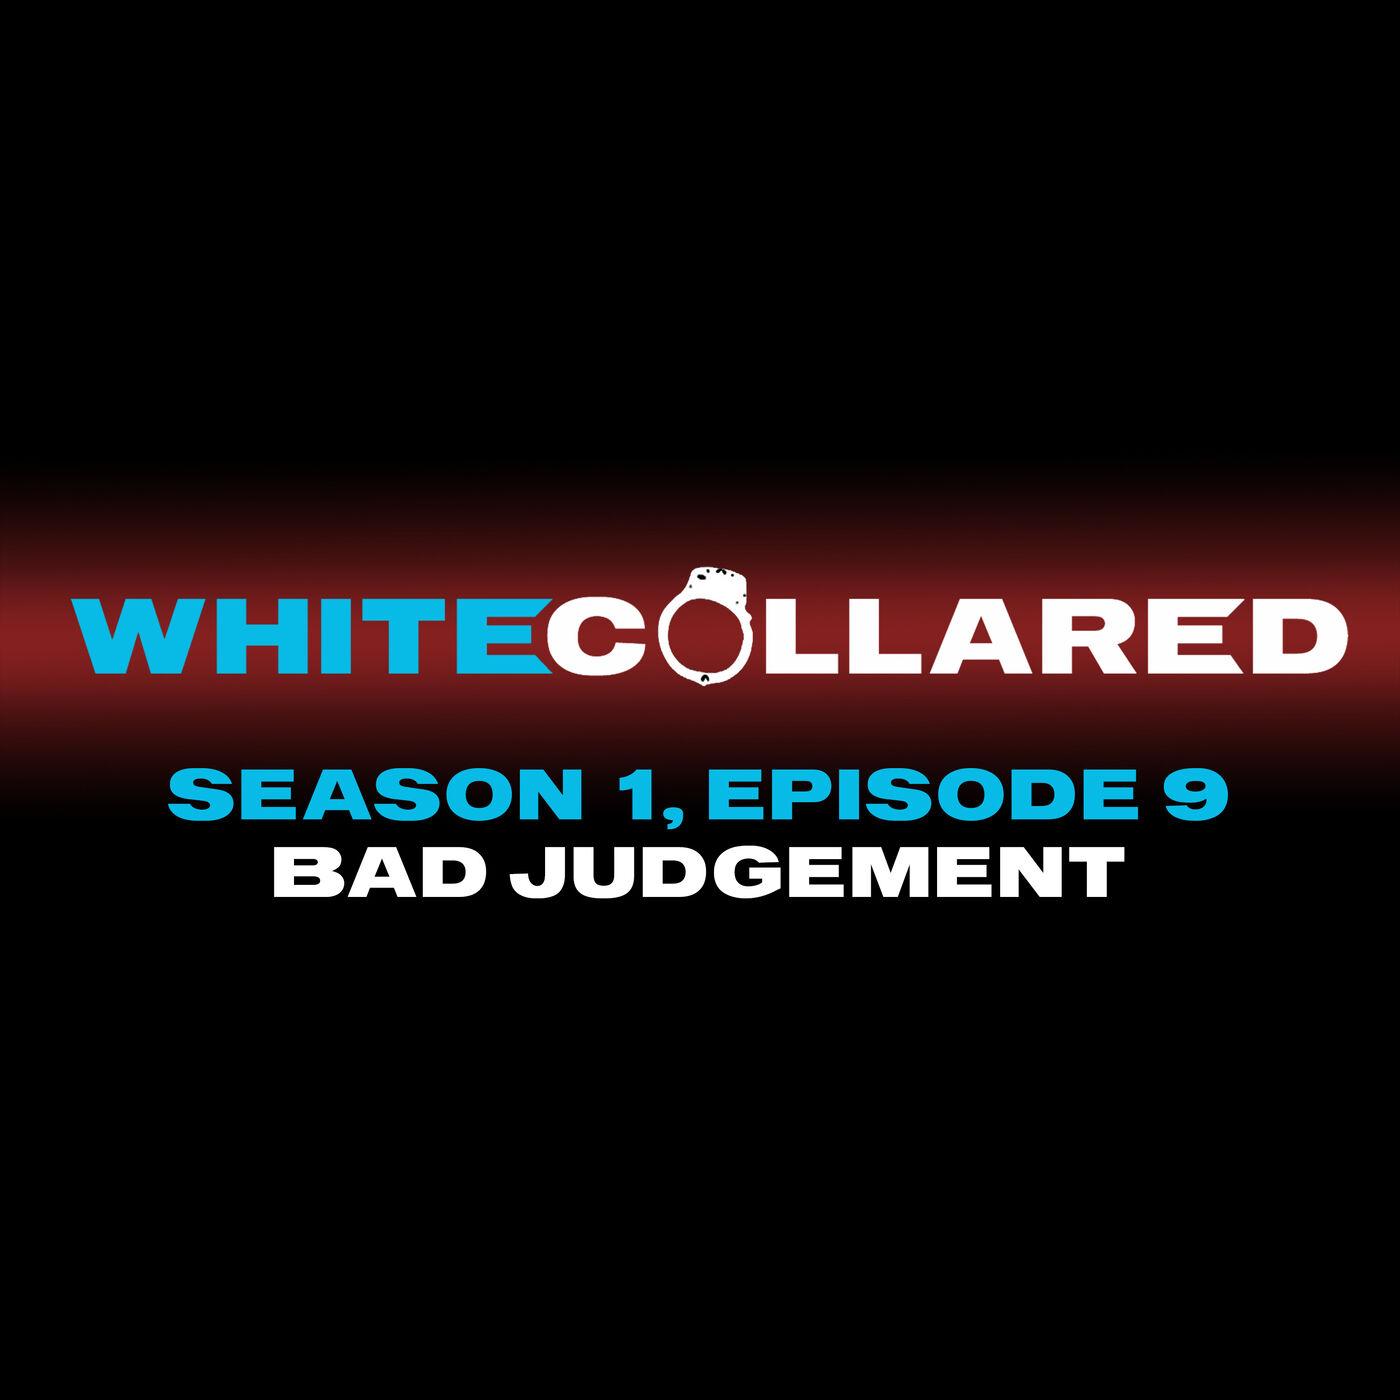 Bad Judgement